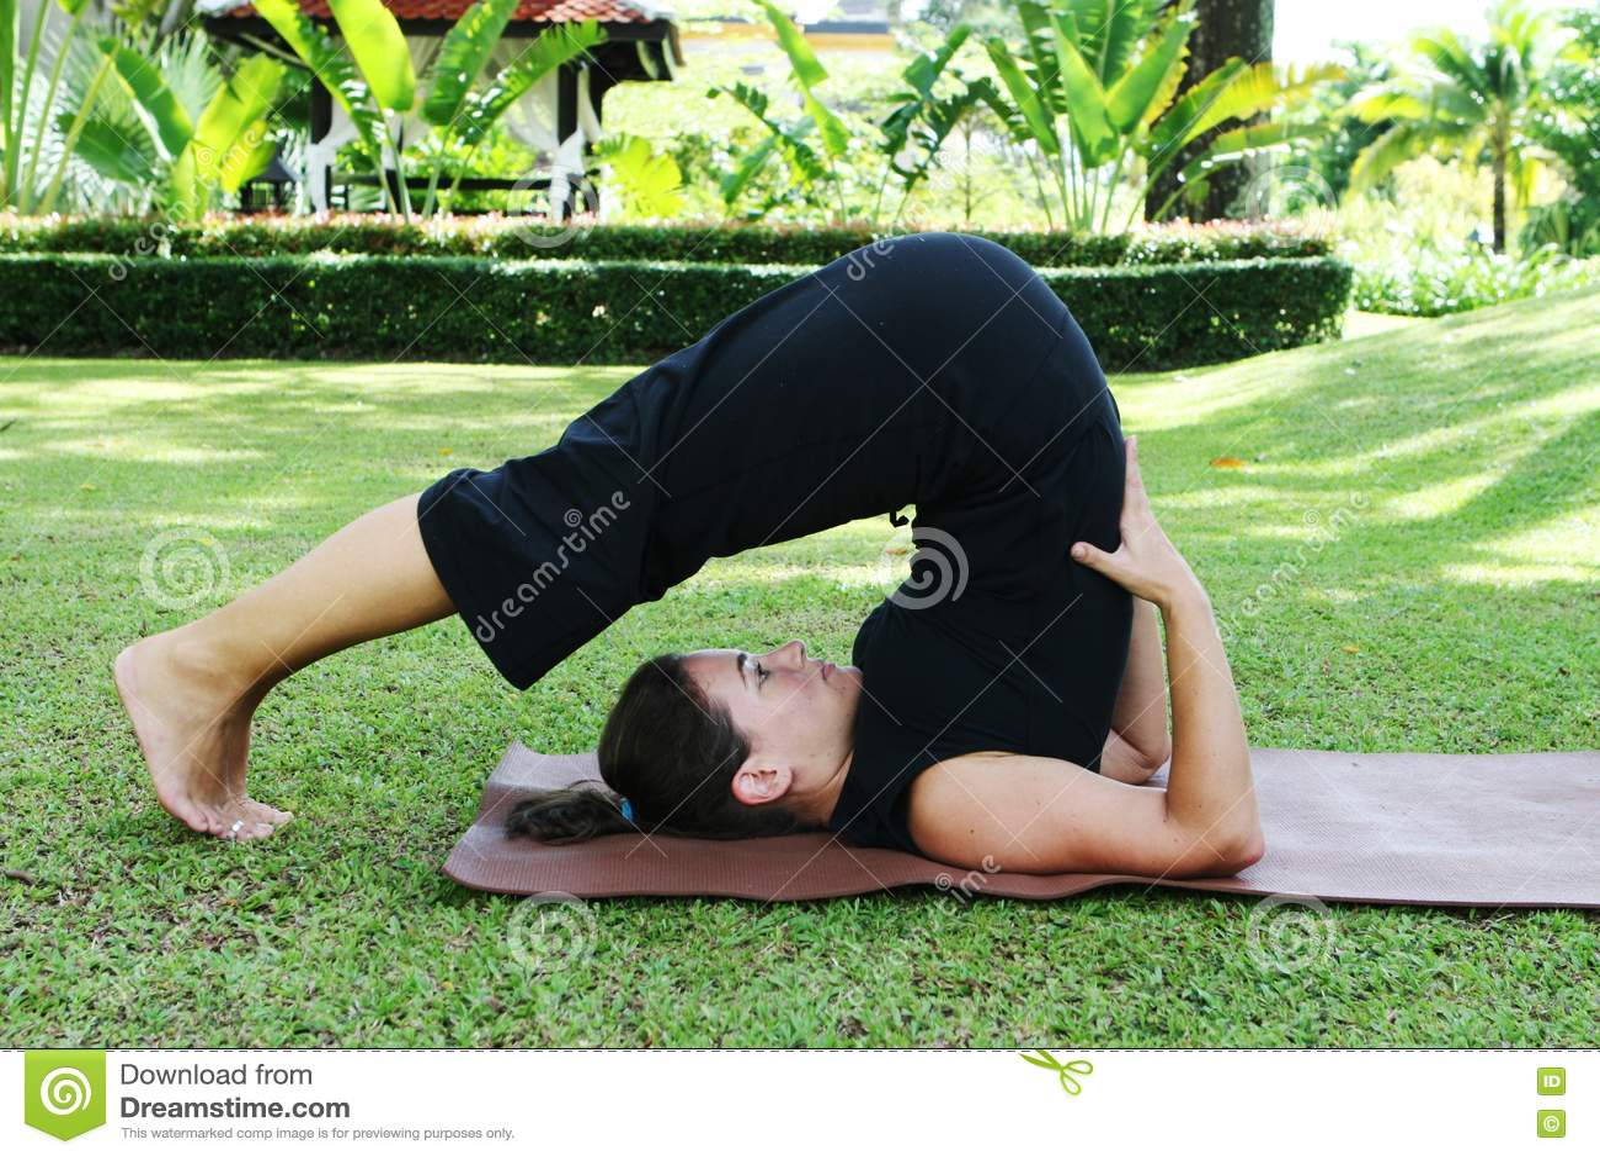 834620de5c6 Free Stock Photography  Yoga Picture. Image  5812867